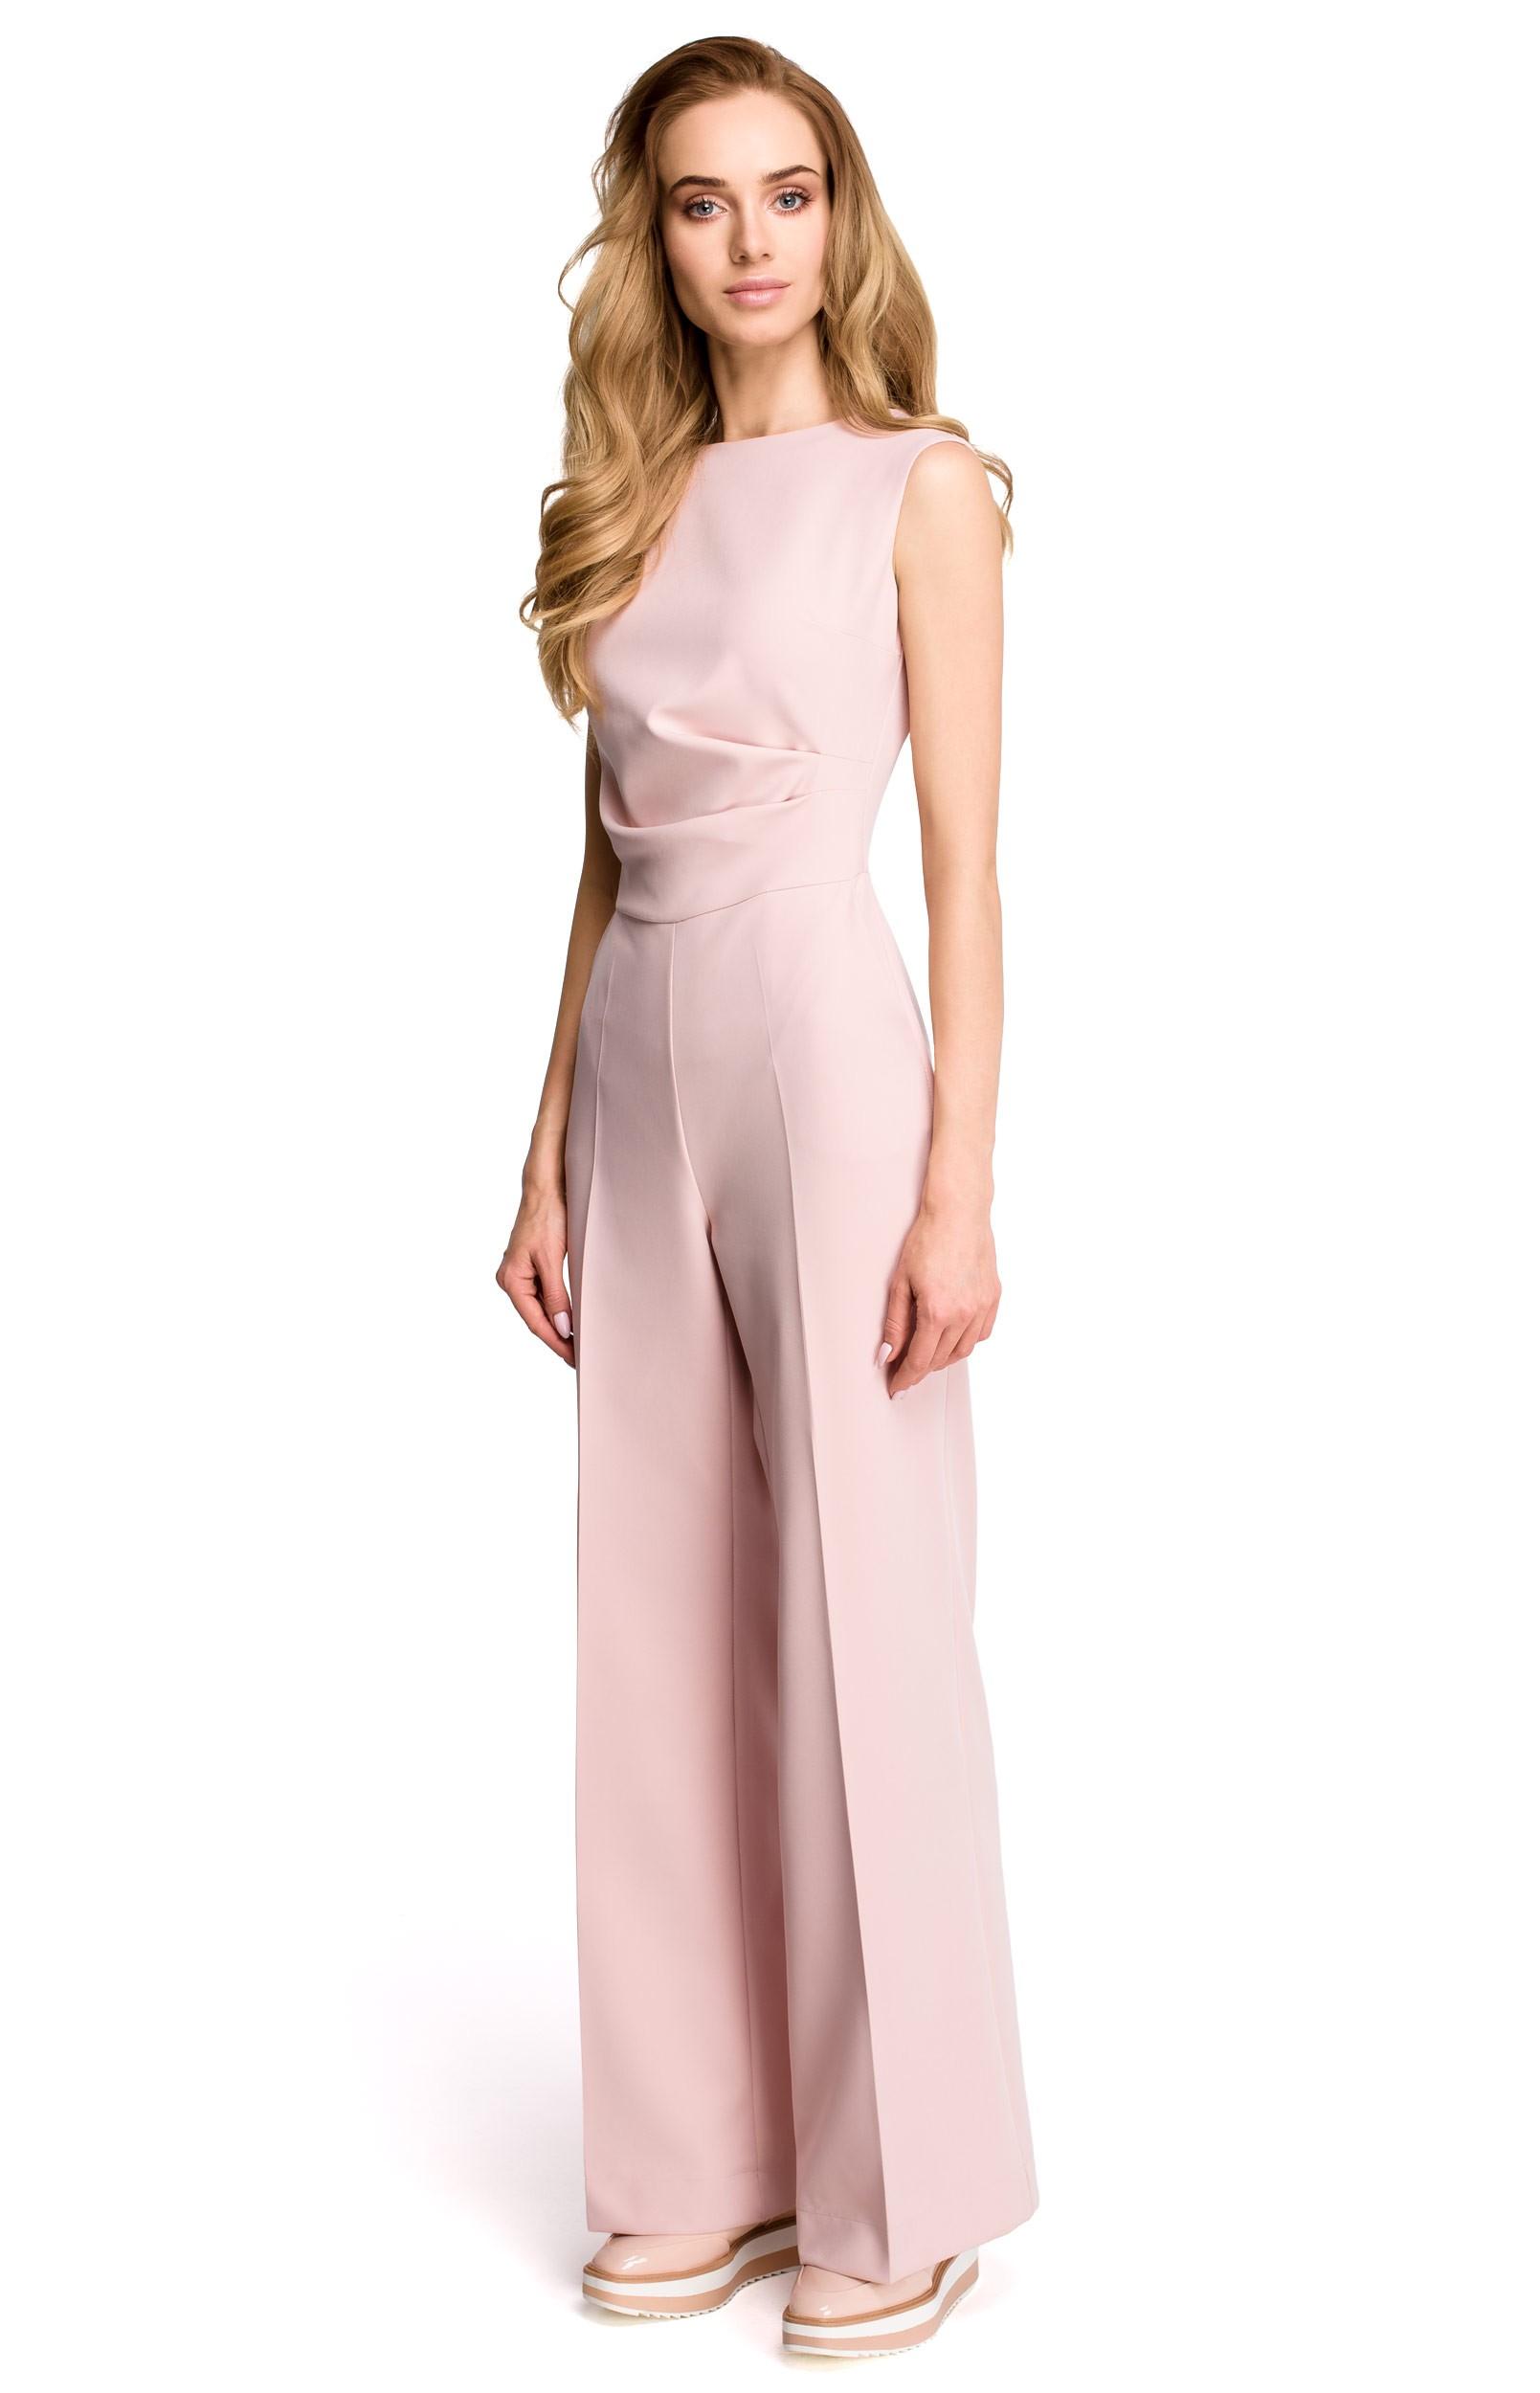 combinaison pantalon drap e rose style s115ro. Black Bedroom Furniture Sets. Home Design Ideas